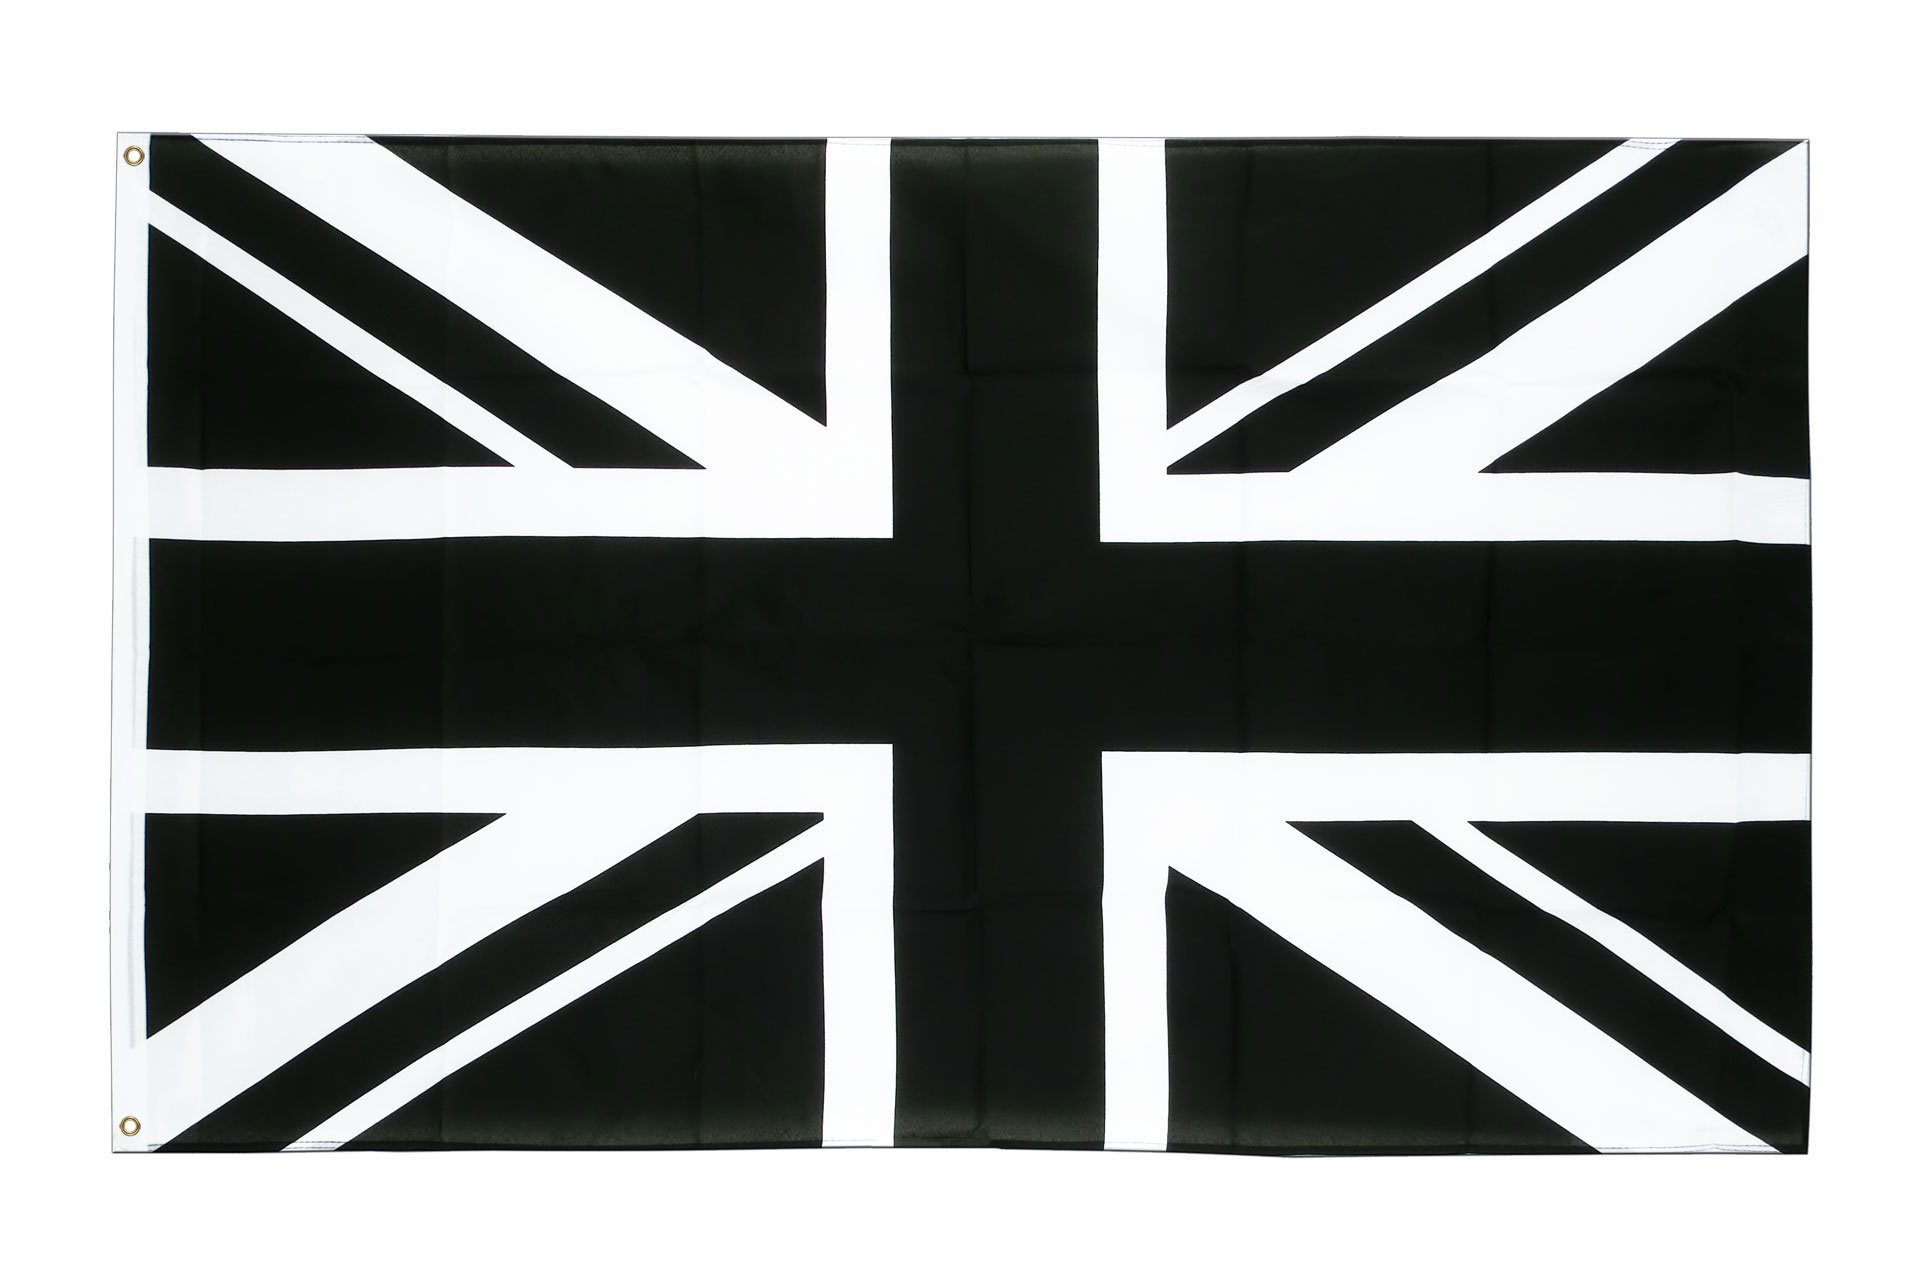 Buy union jack black flag ft cm royal flags